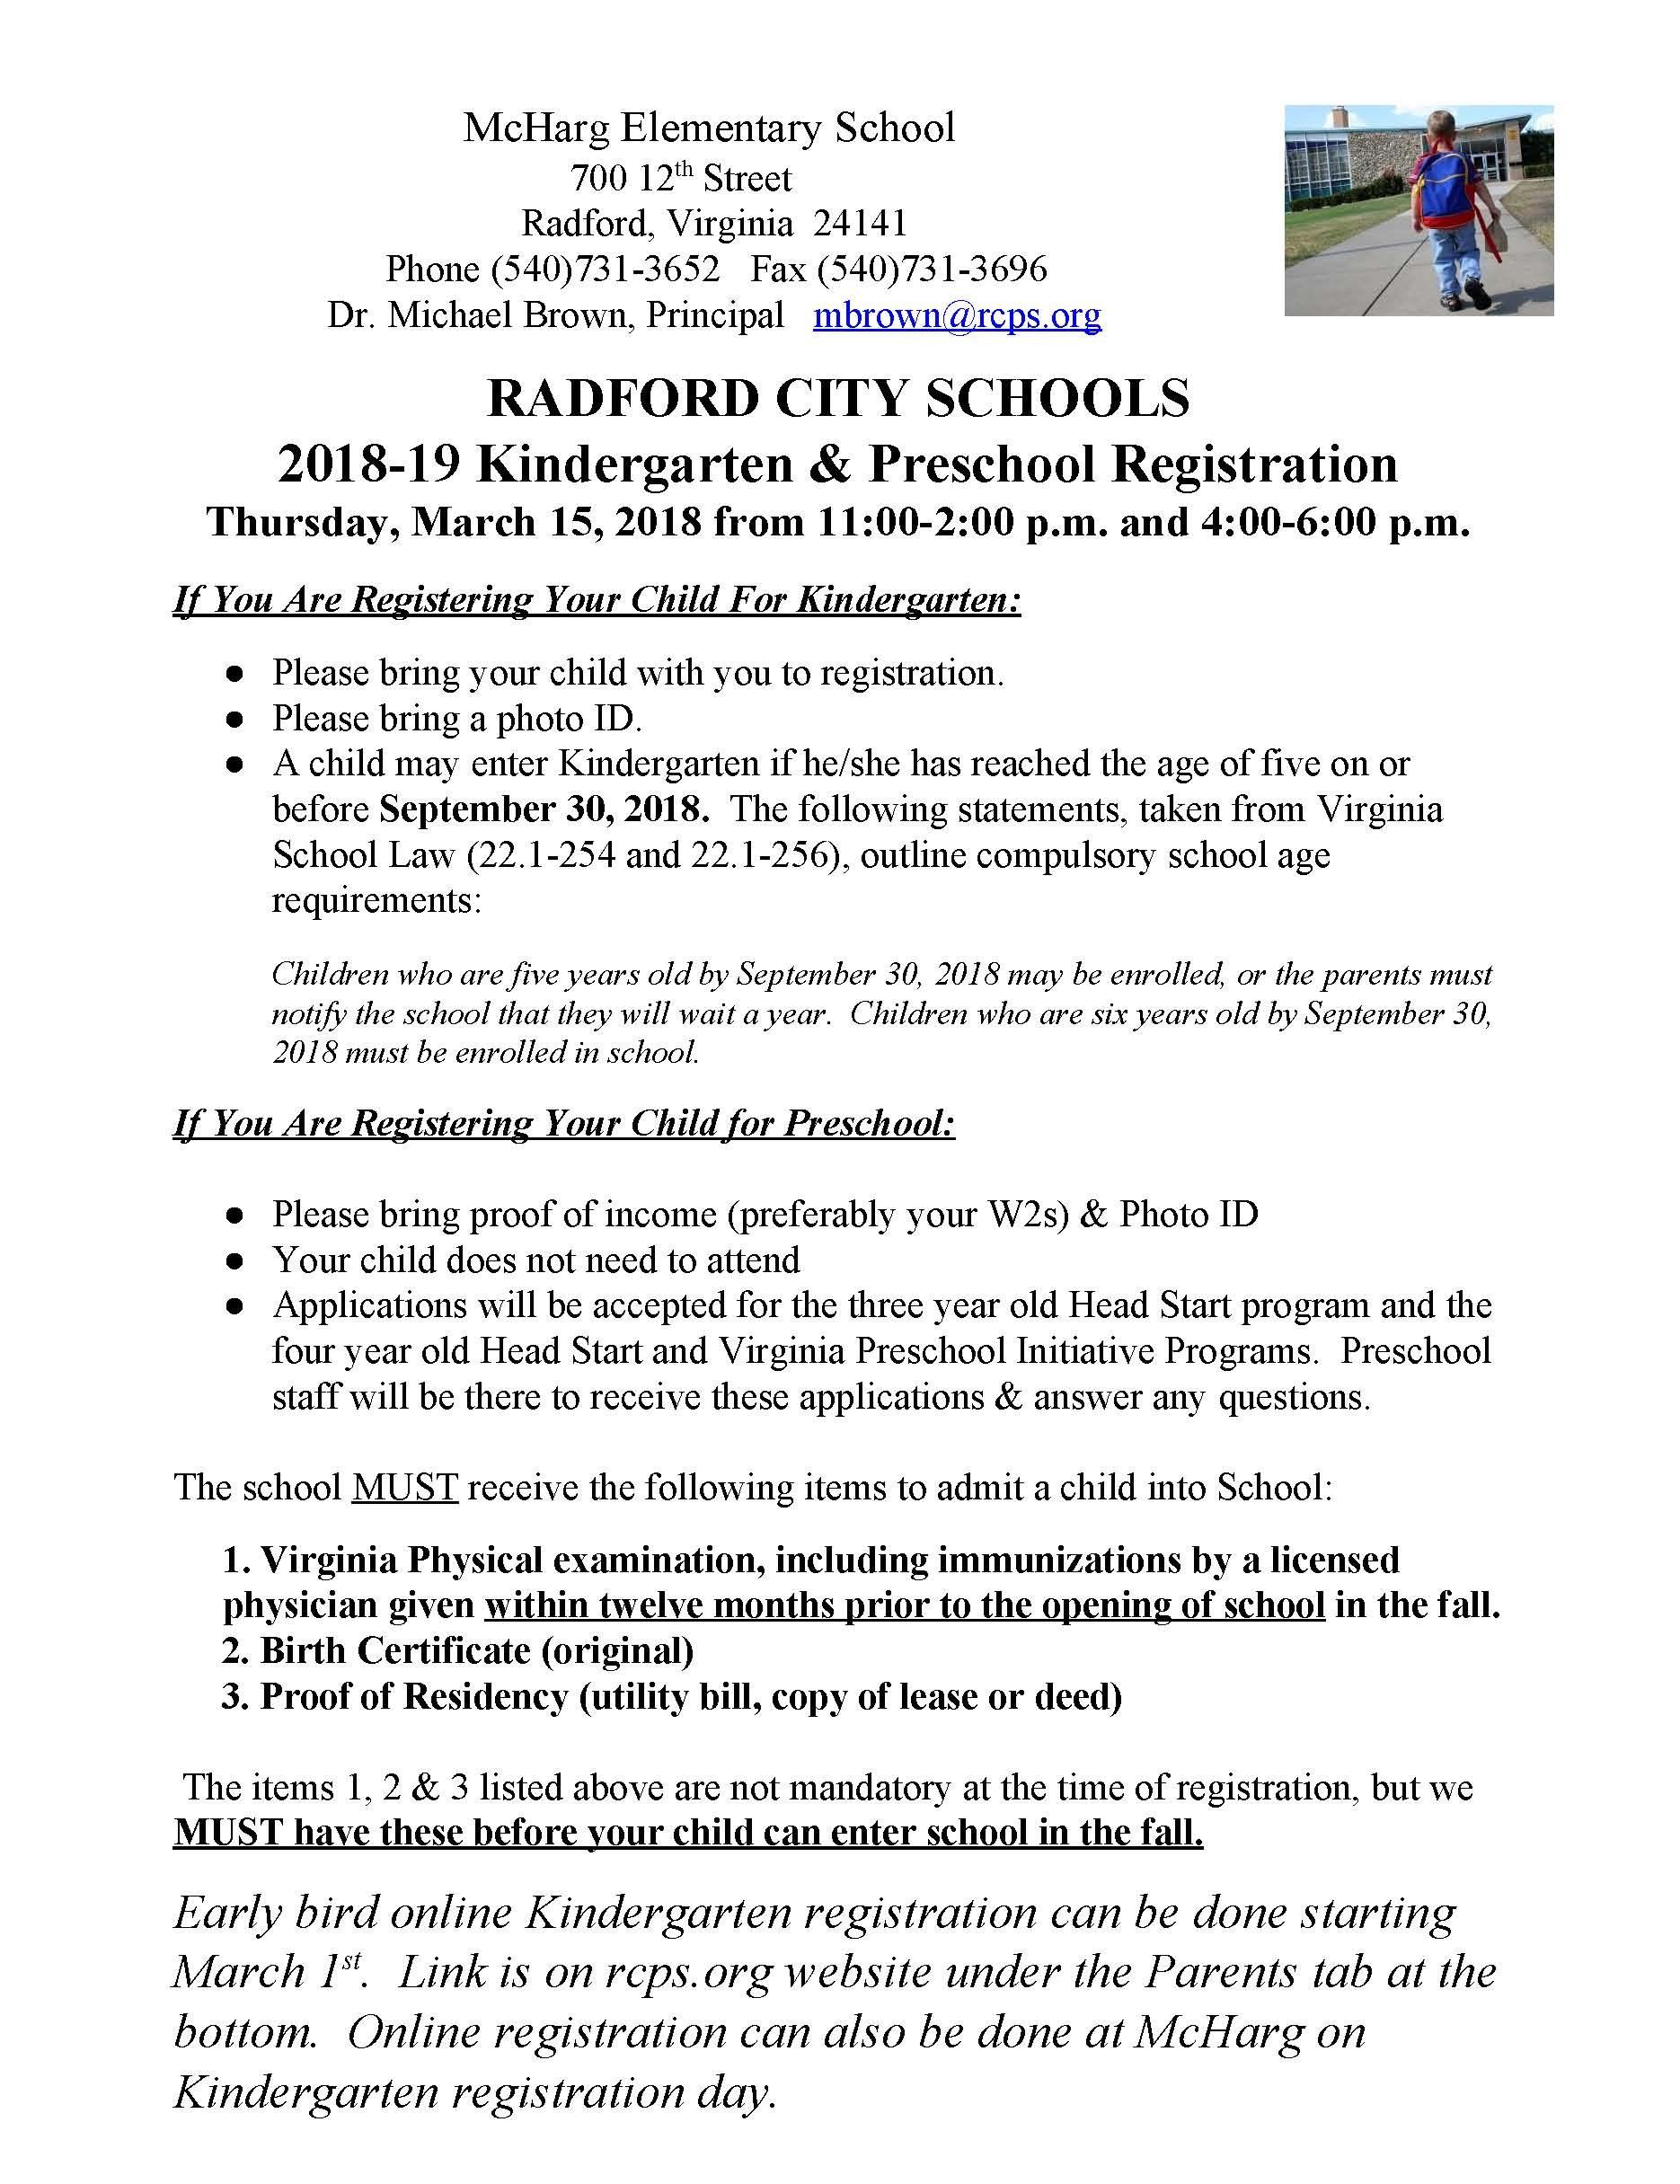 Kindergarten Registration Miscellaneous Radford City Schools